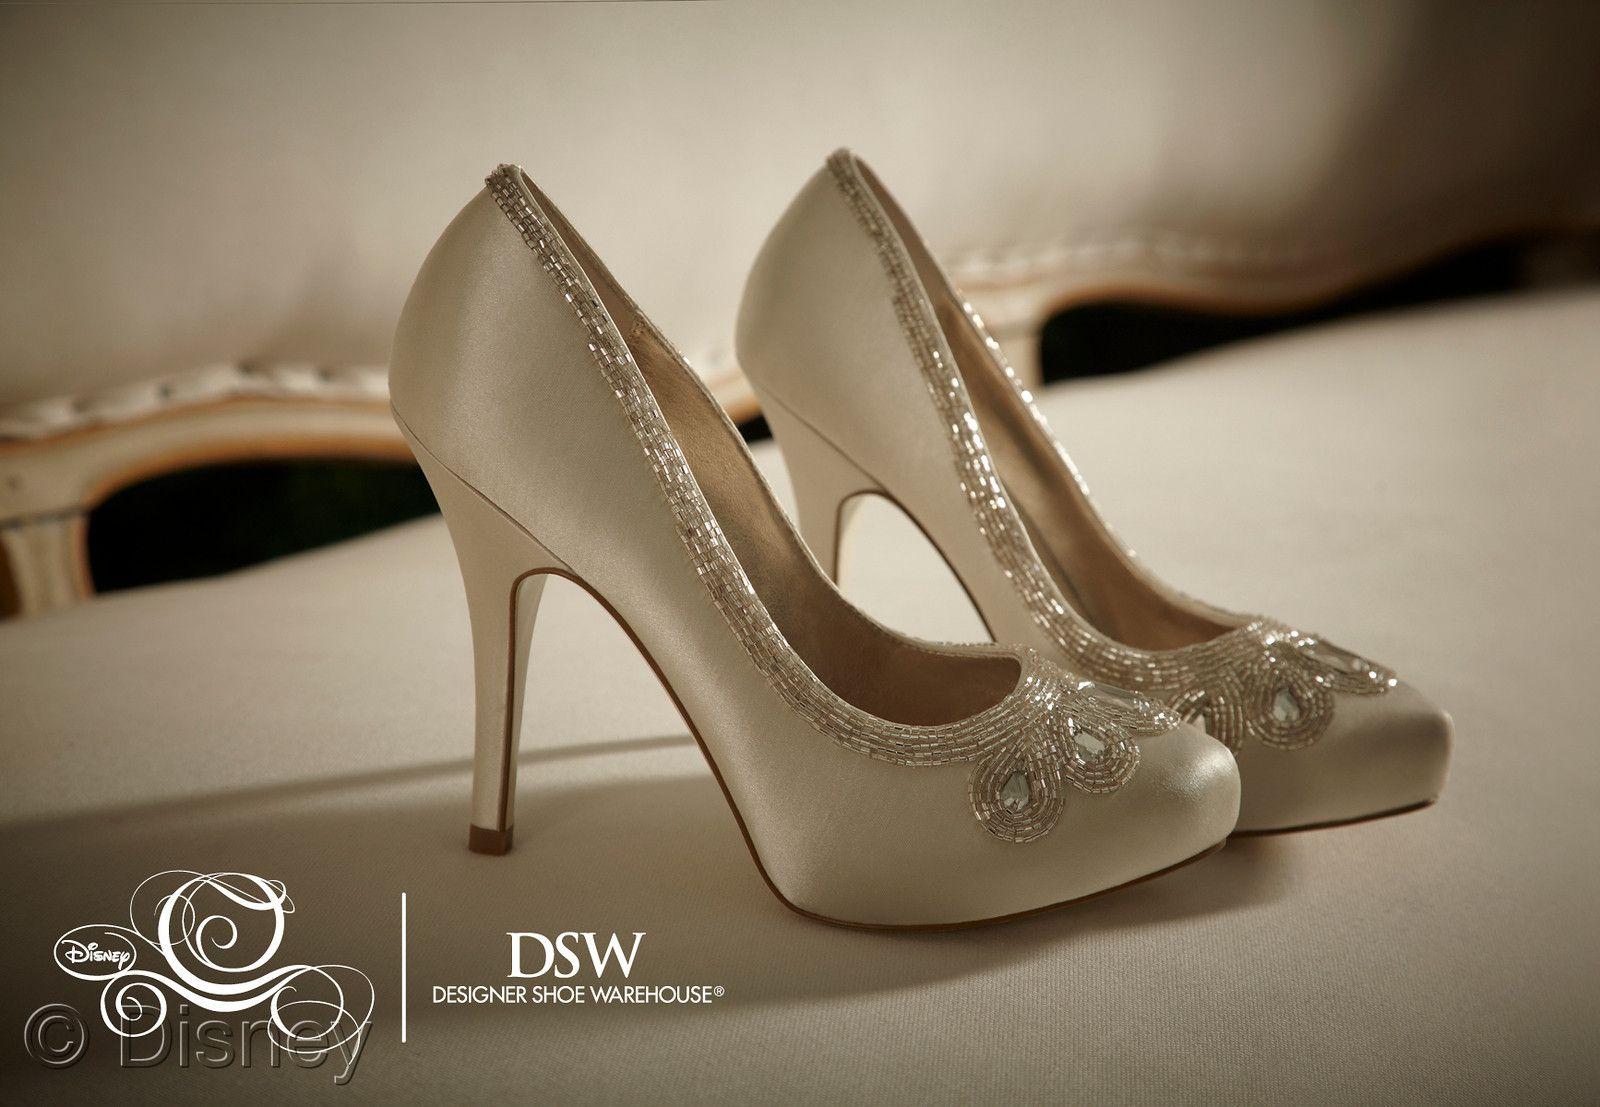 Dsw Cinderella Shoes Jpeg 1600 1107 Cinderella Shoes Disney Shoes Wedding Shoes